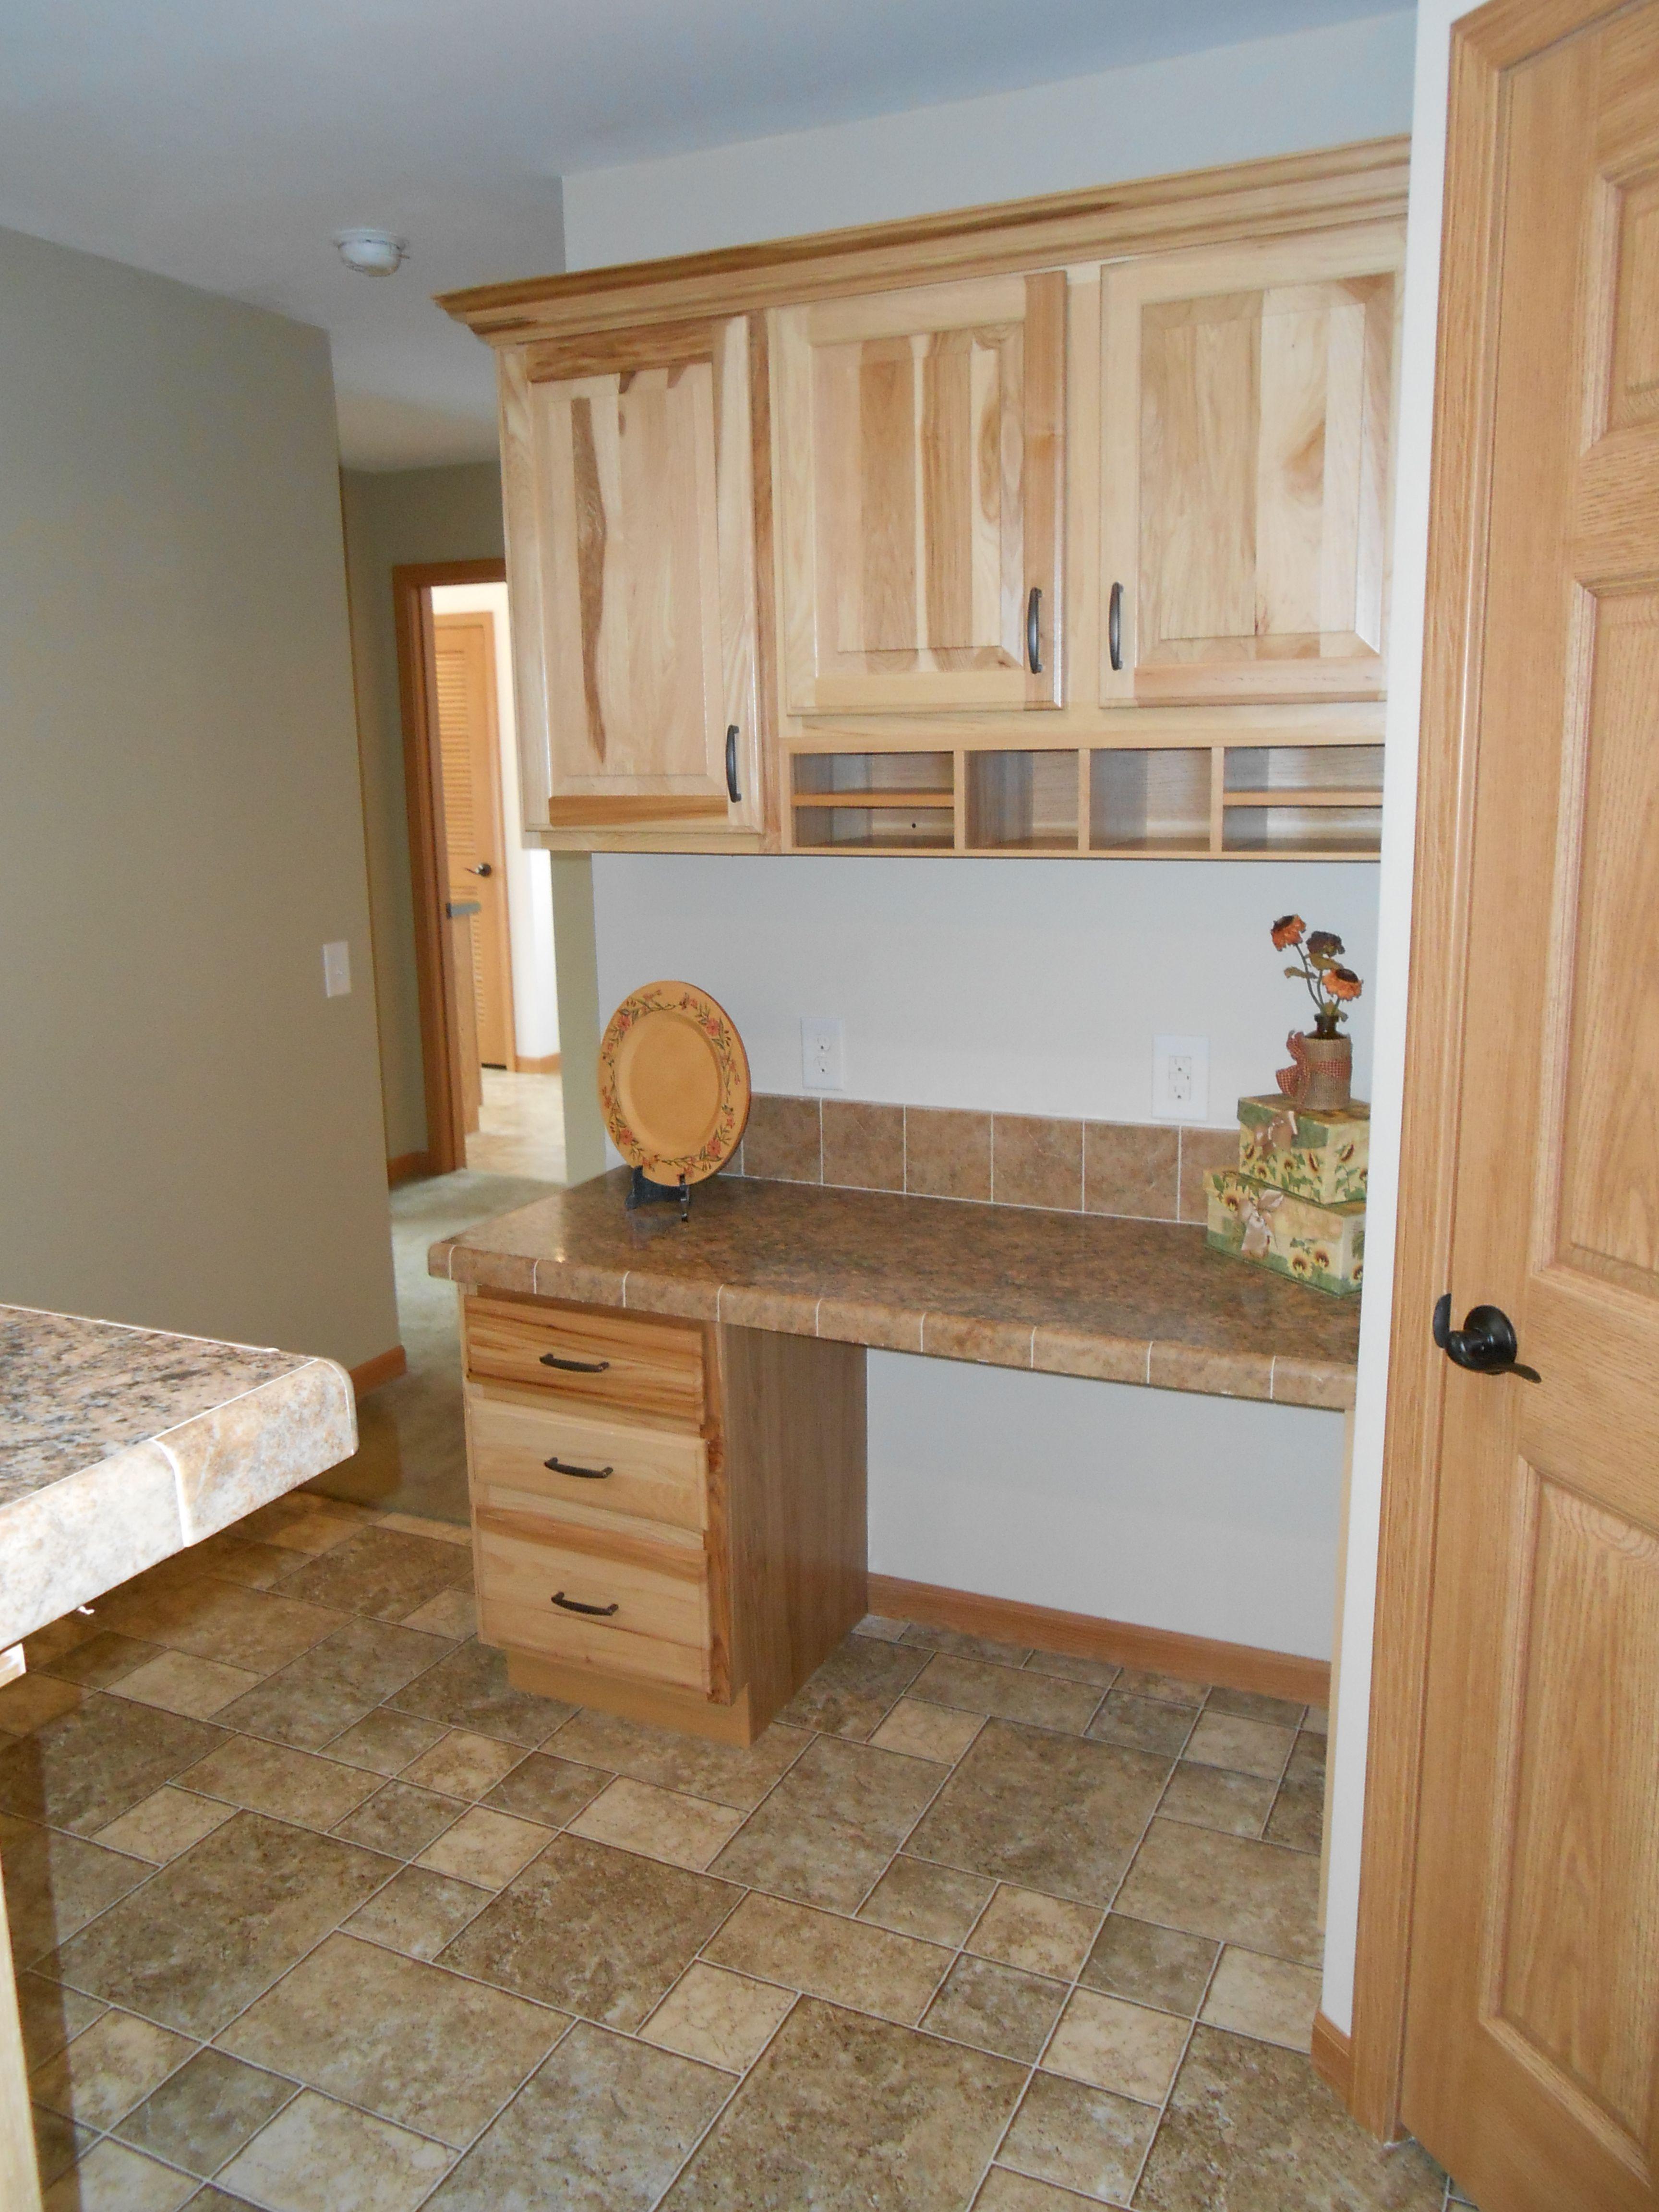 New Era Modulars Merillat Hickory Cabinets Manufactured